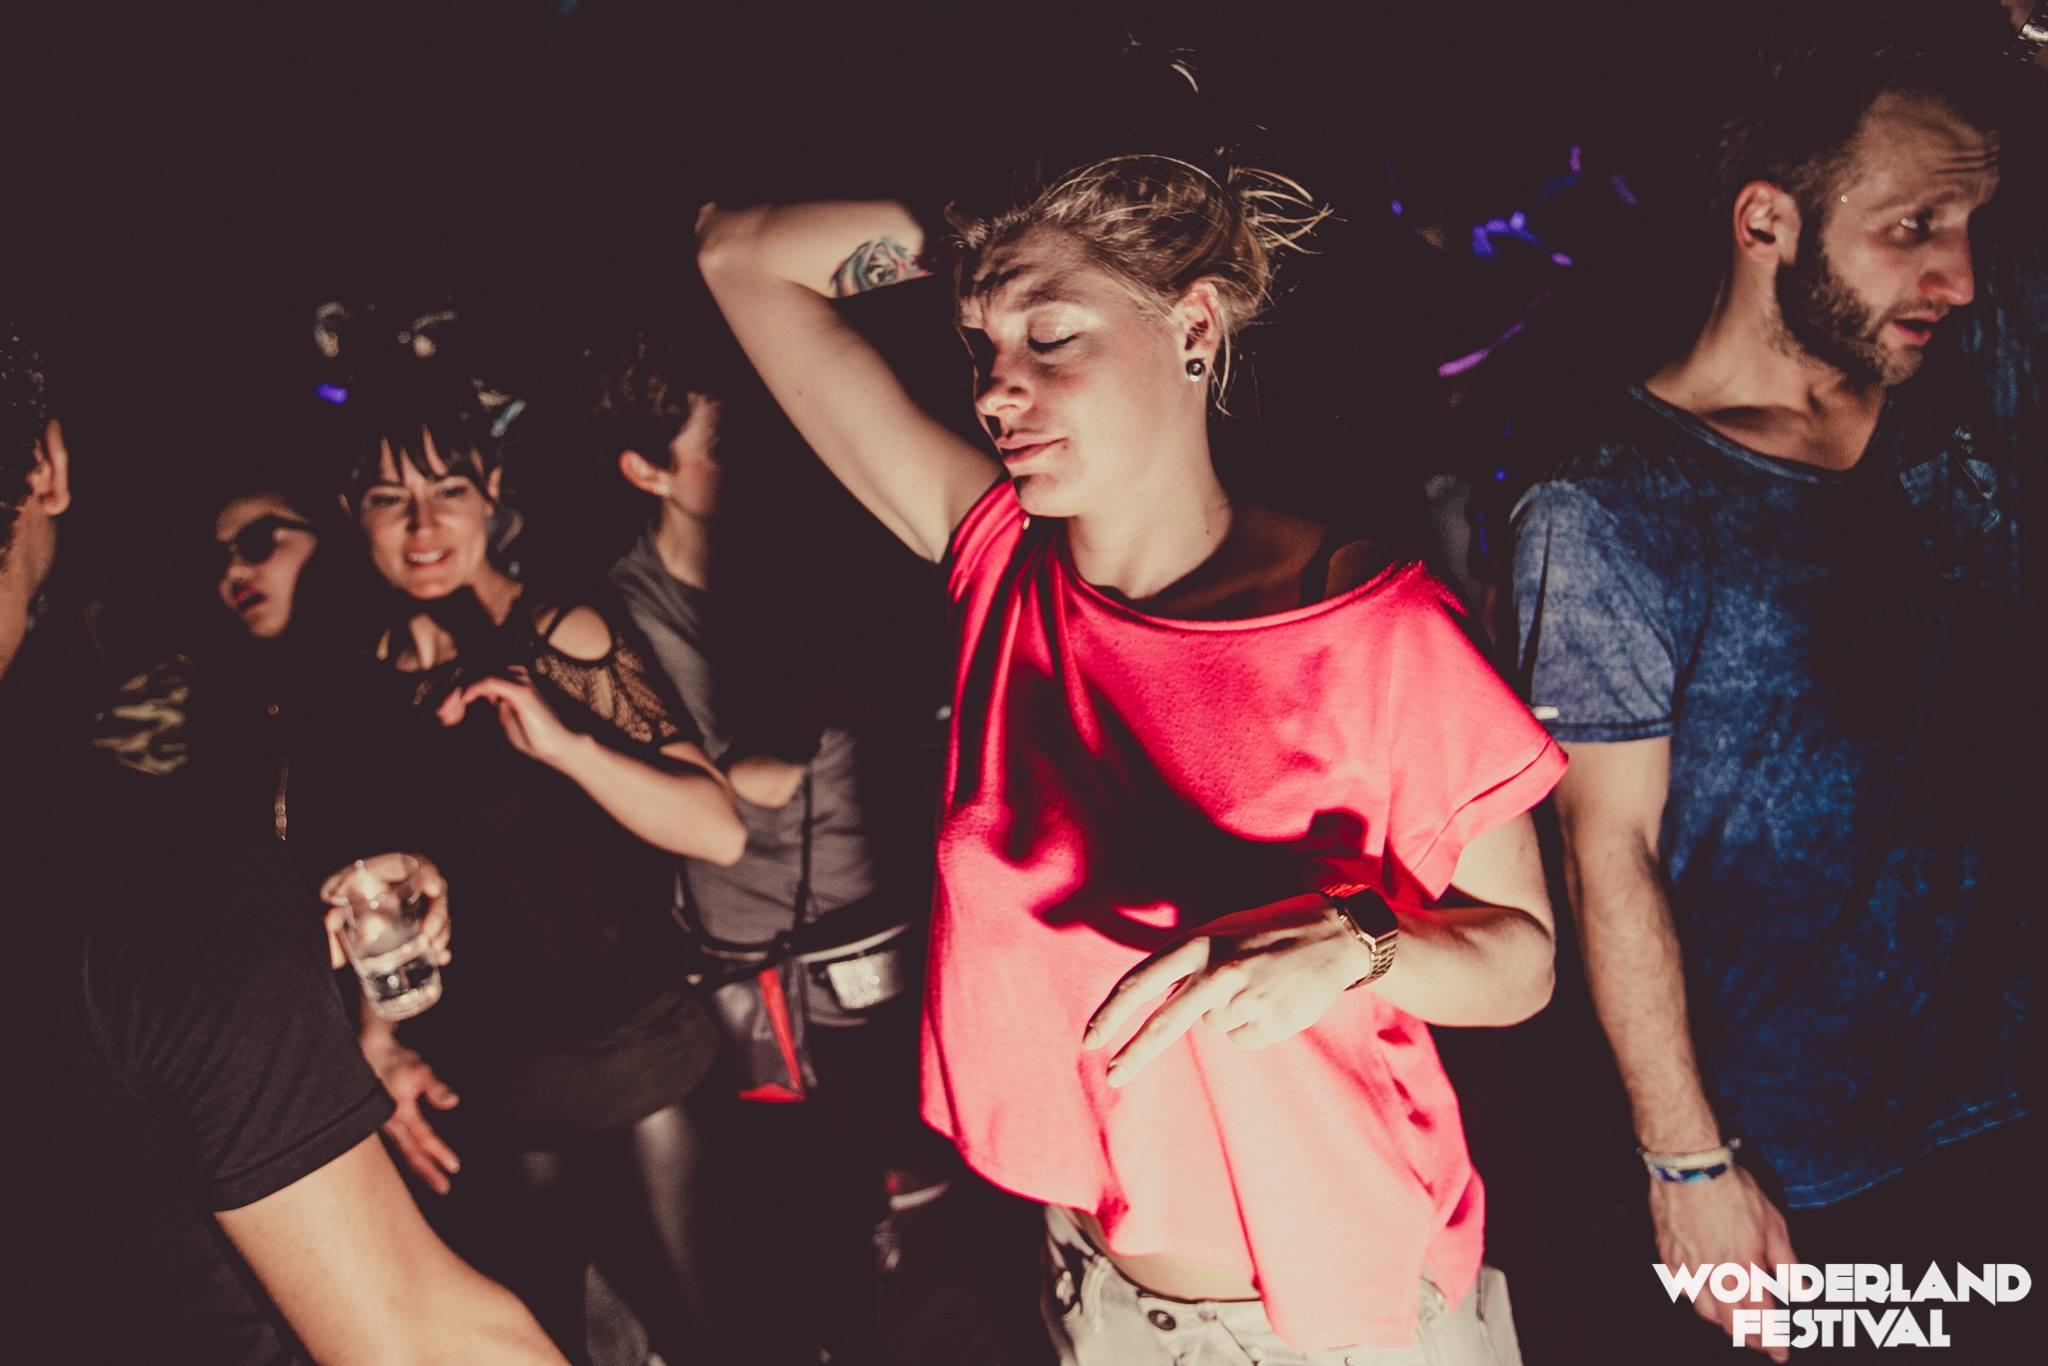 Wonderland Festival Indoor 2016 - Verknipt